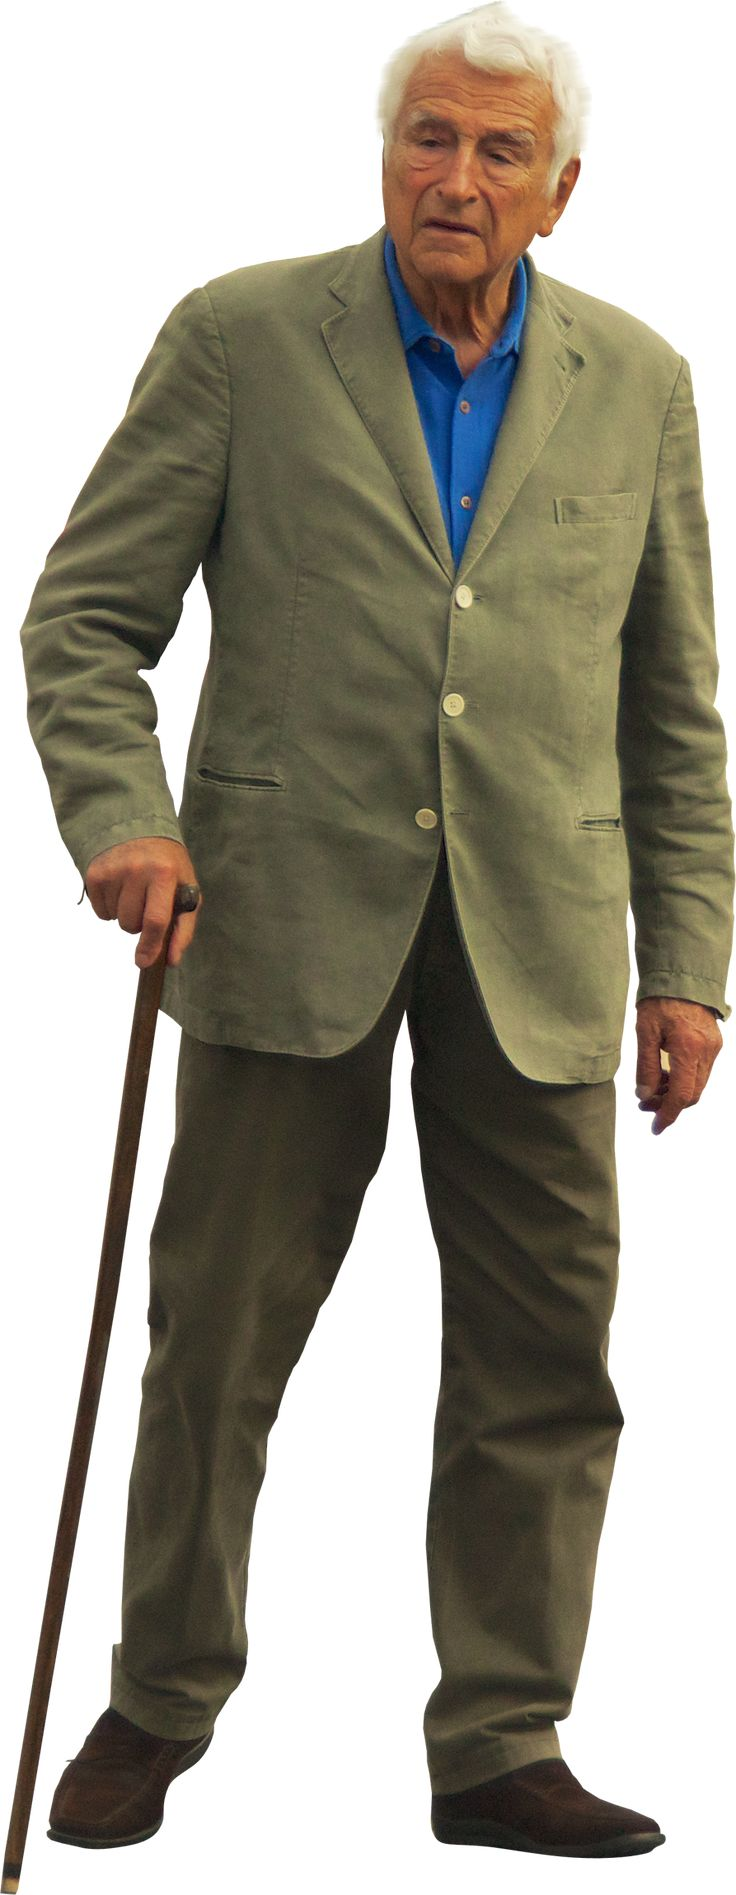 elderly man walking - photo #8